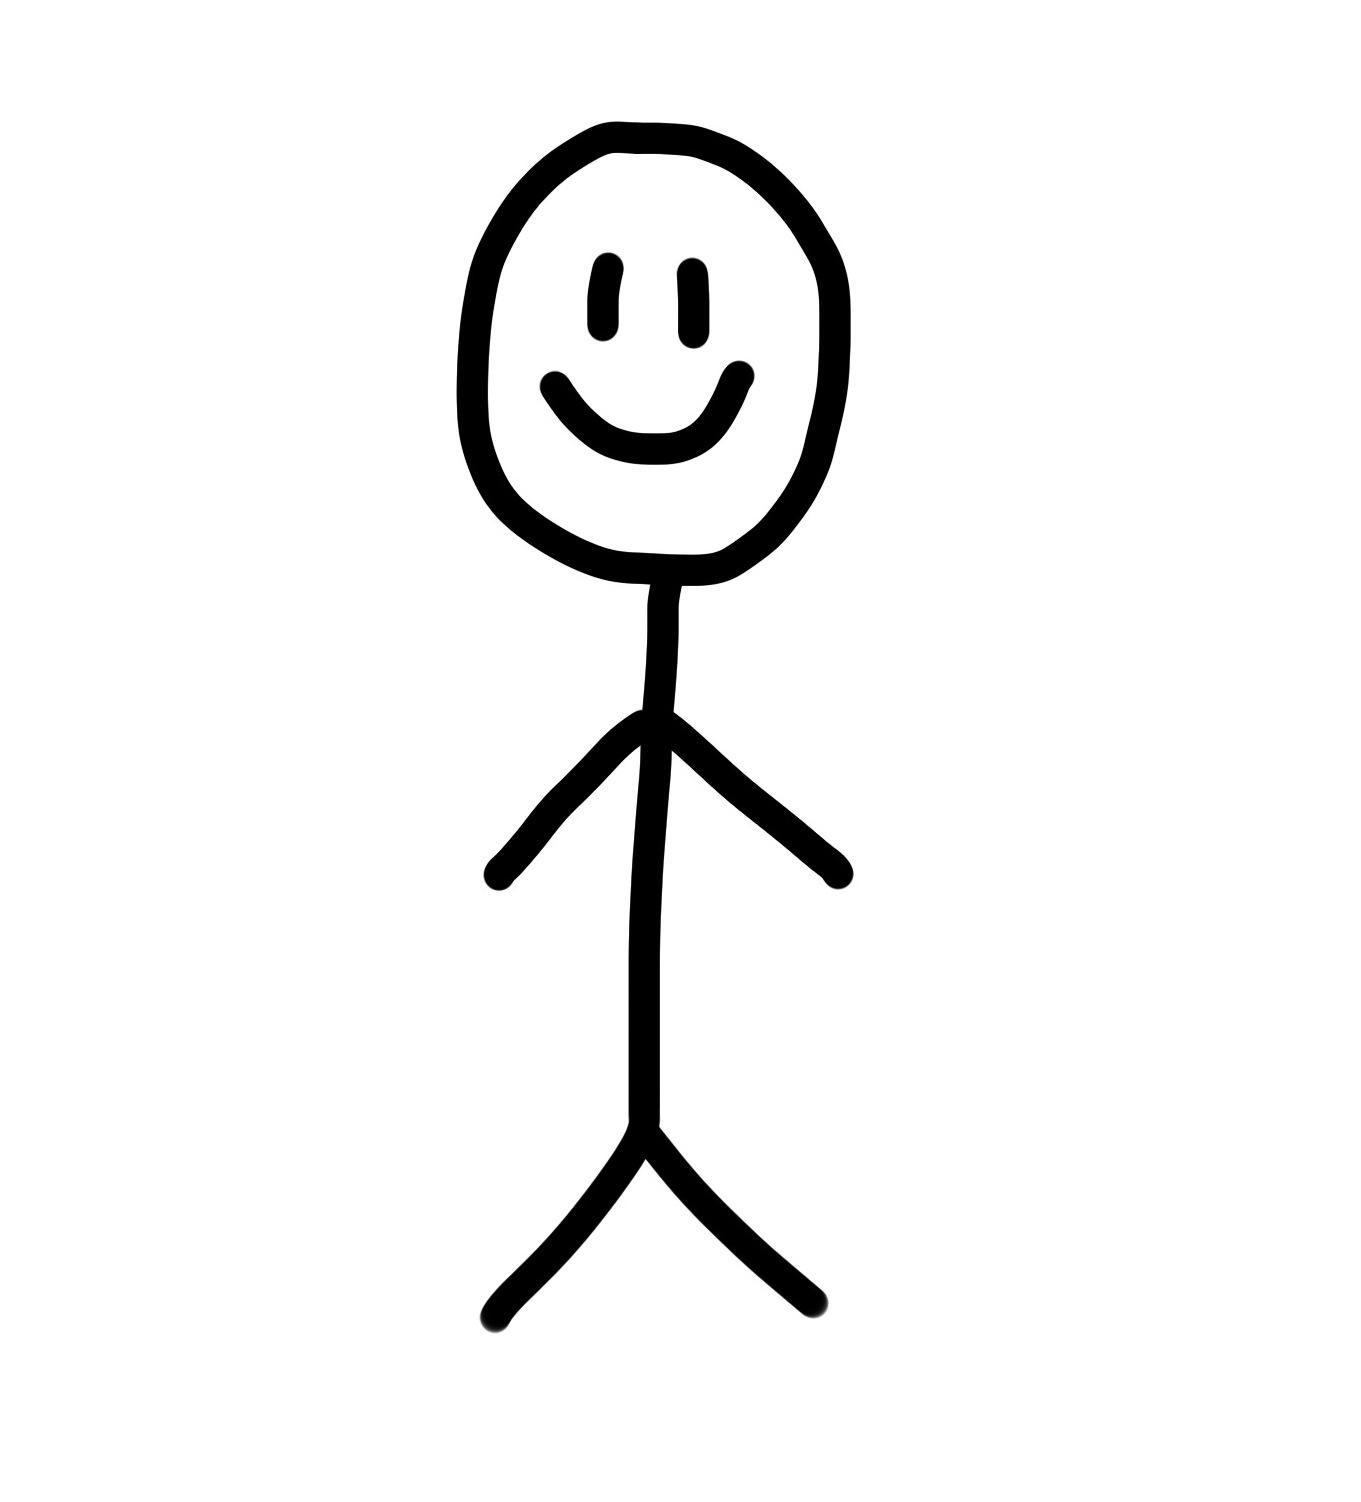 Stick Figure Male - ClipArt Best